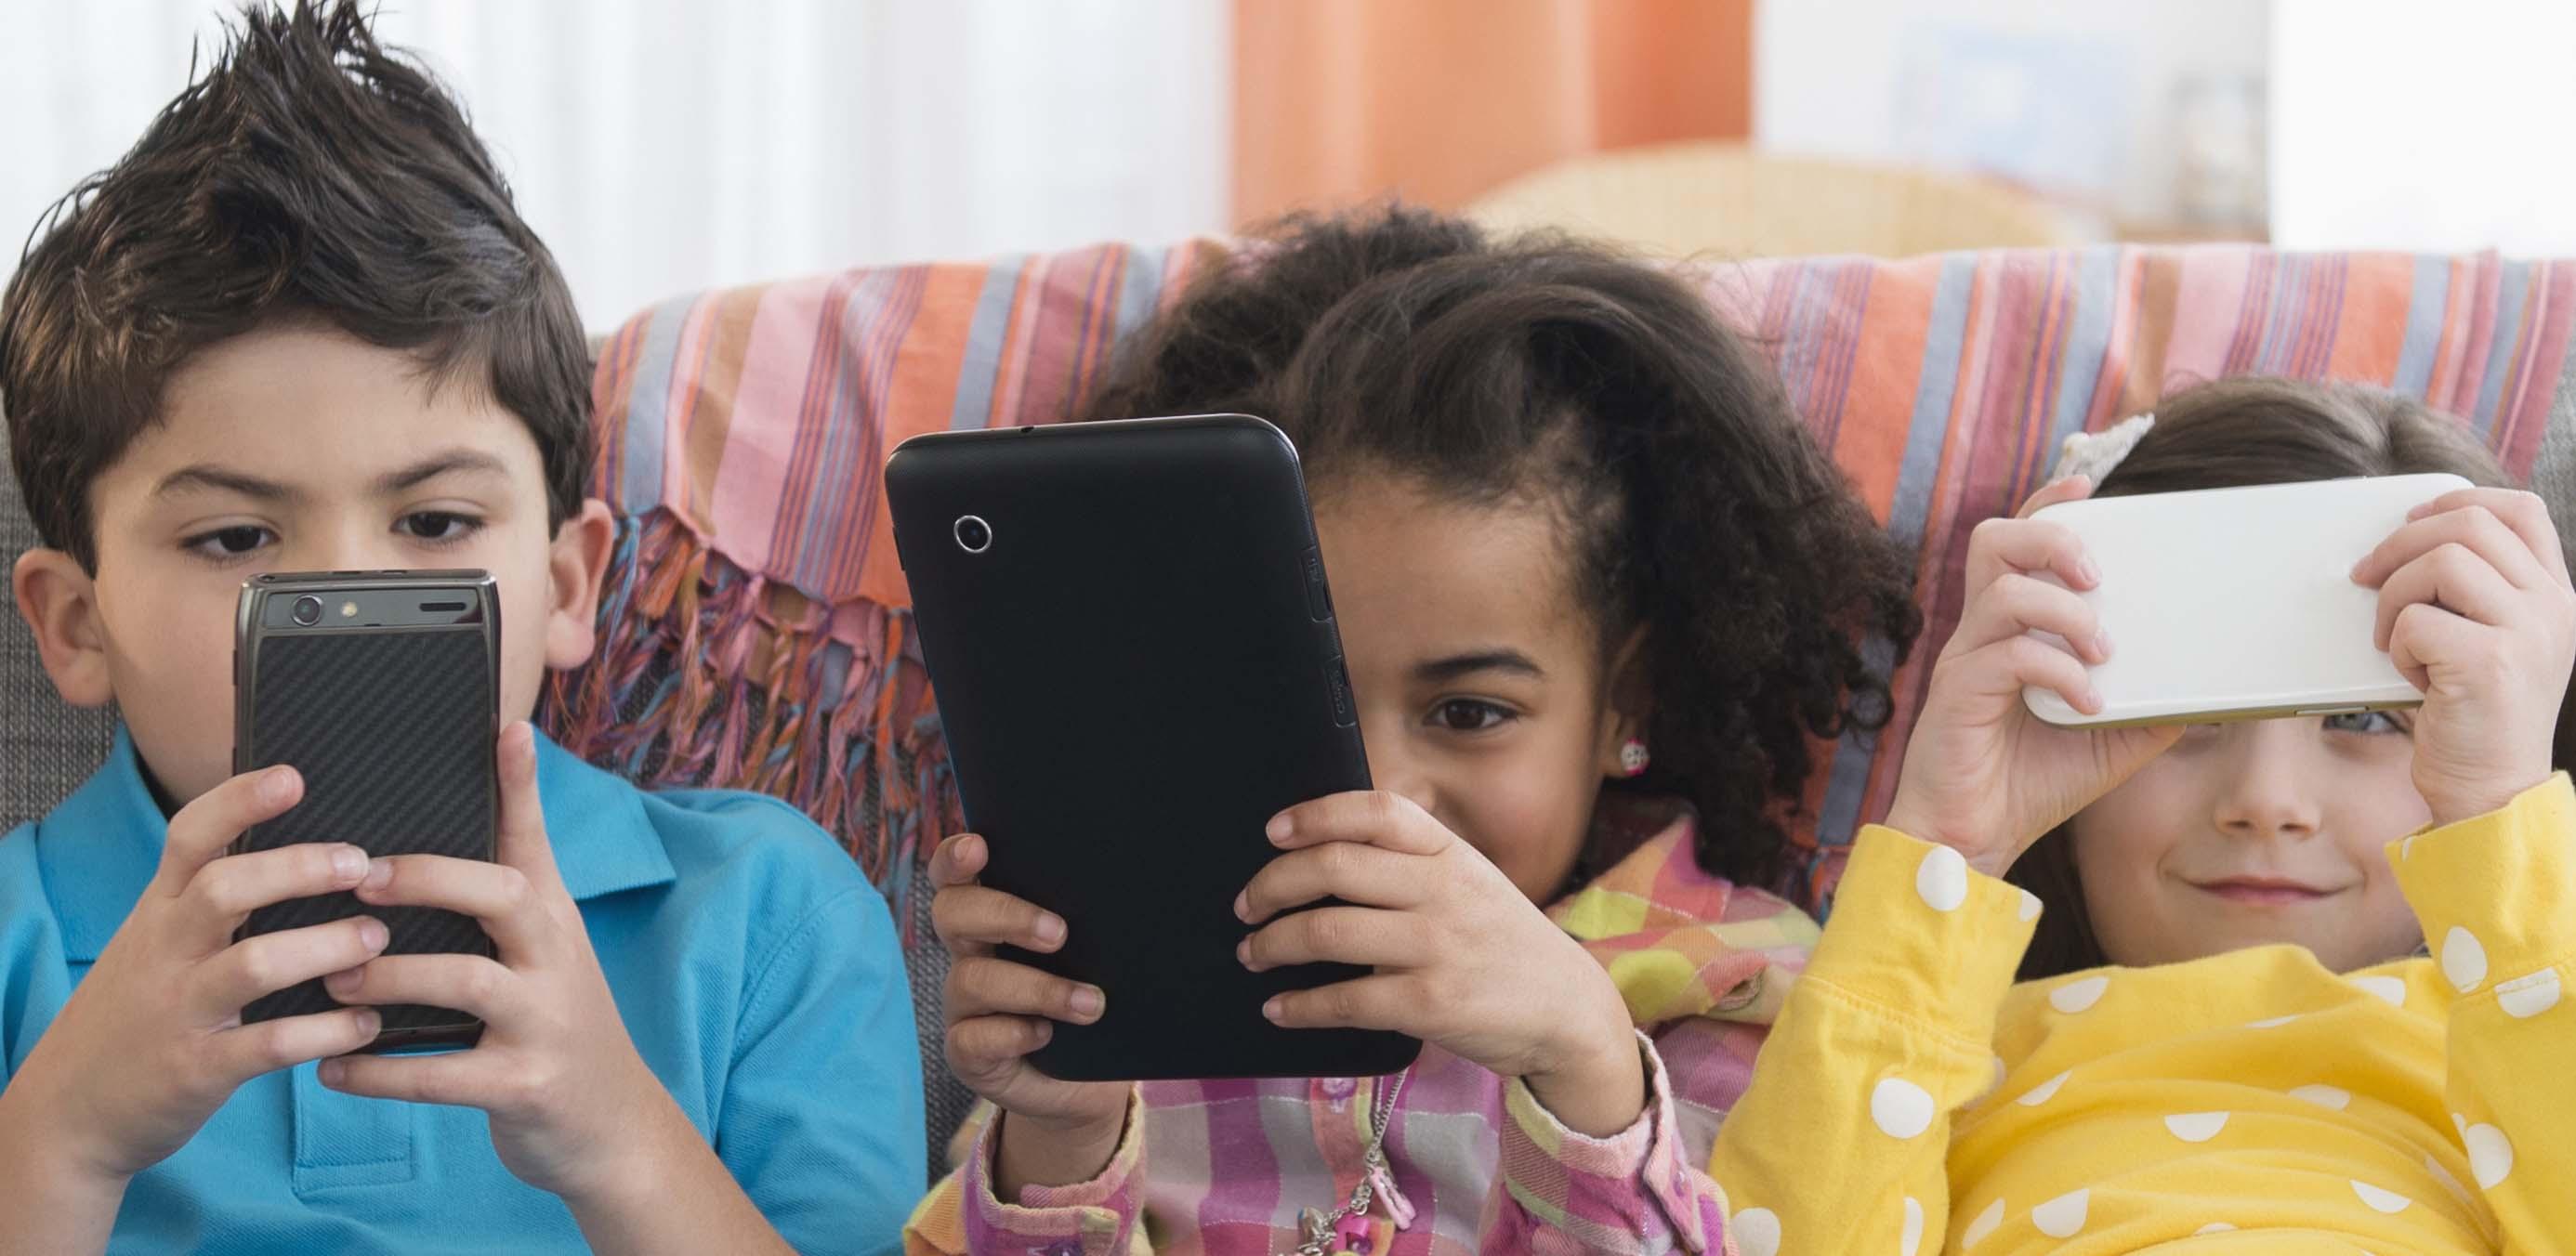 Children & Technology